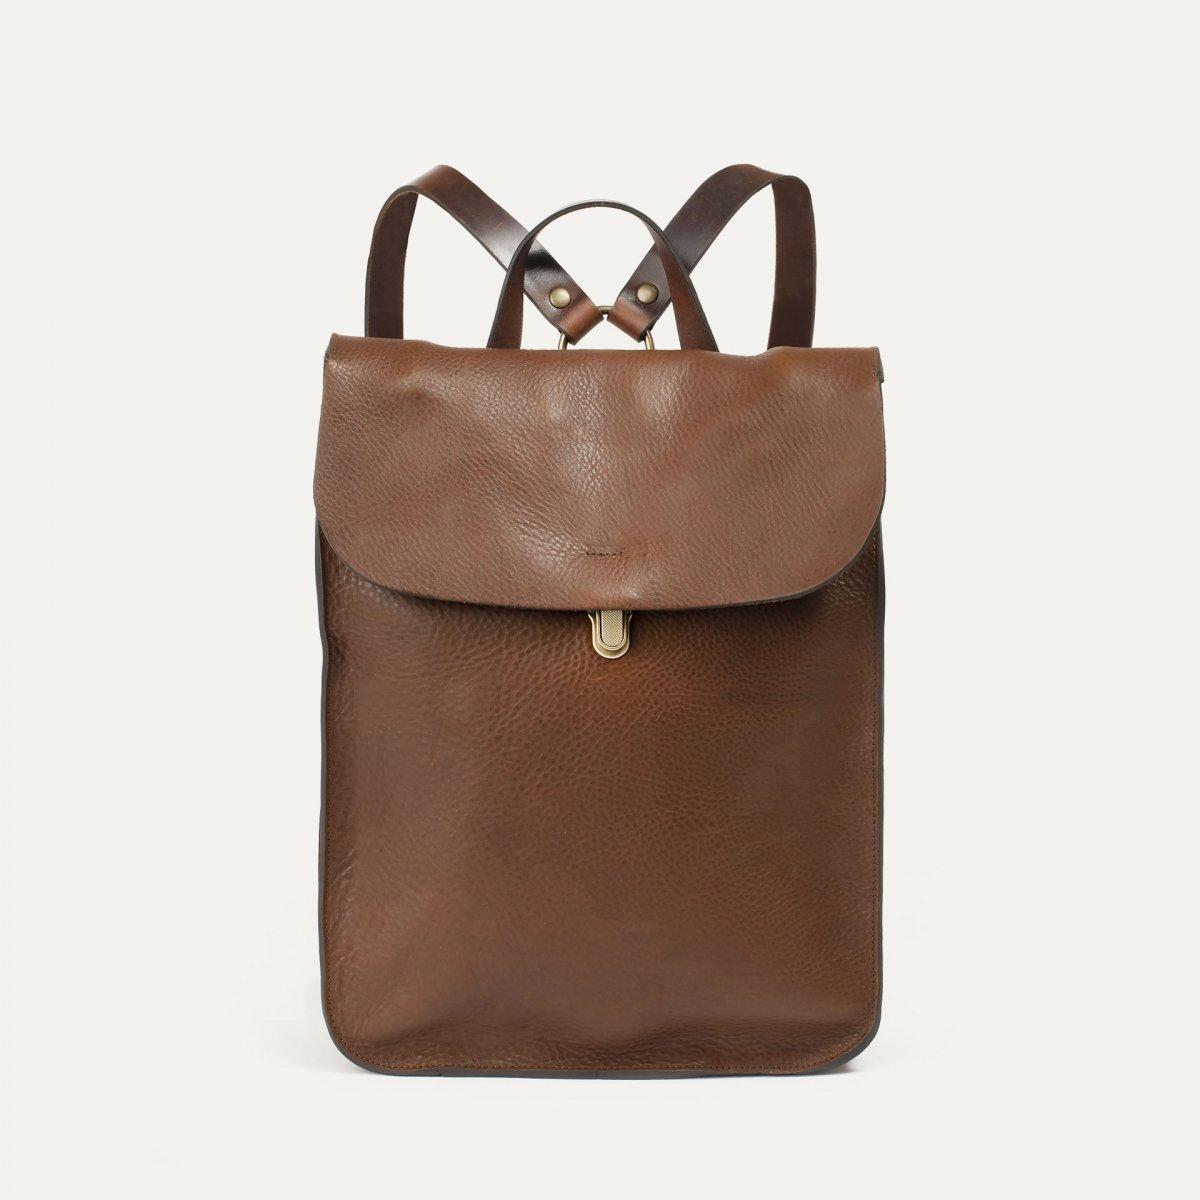 Puncho leather backpack - Cuba Libre / E Pure (image n°1)